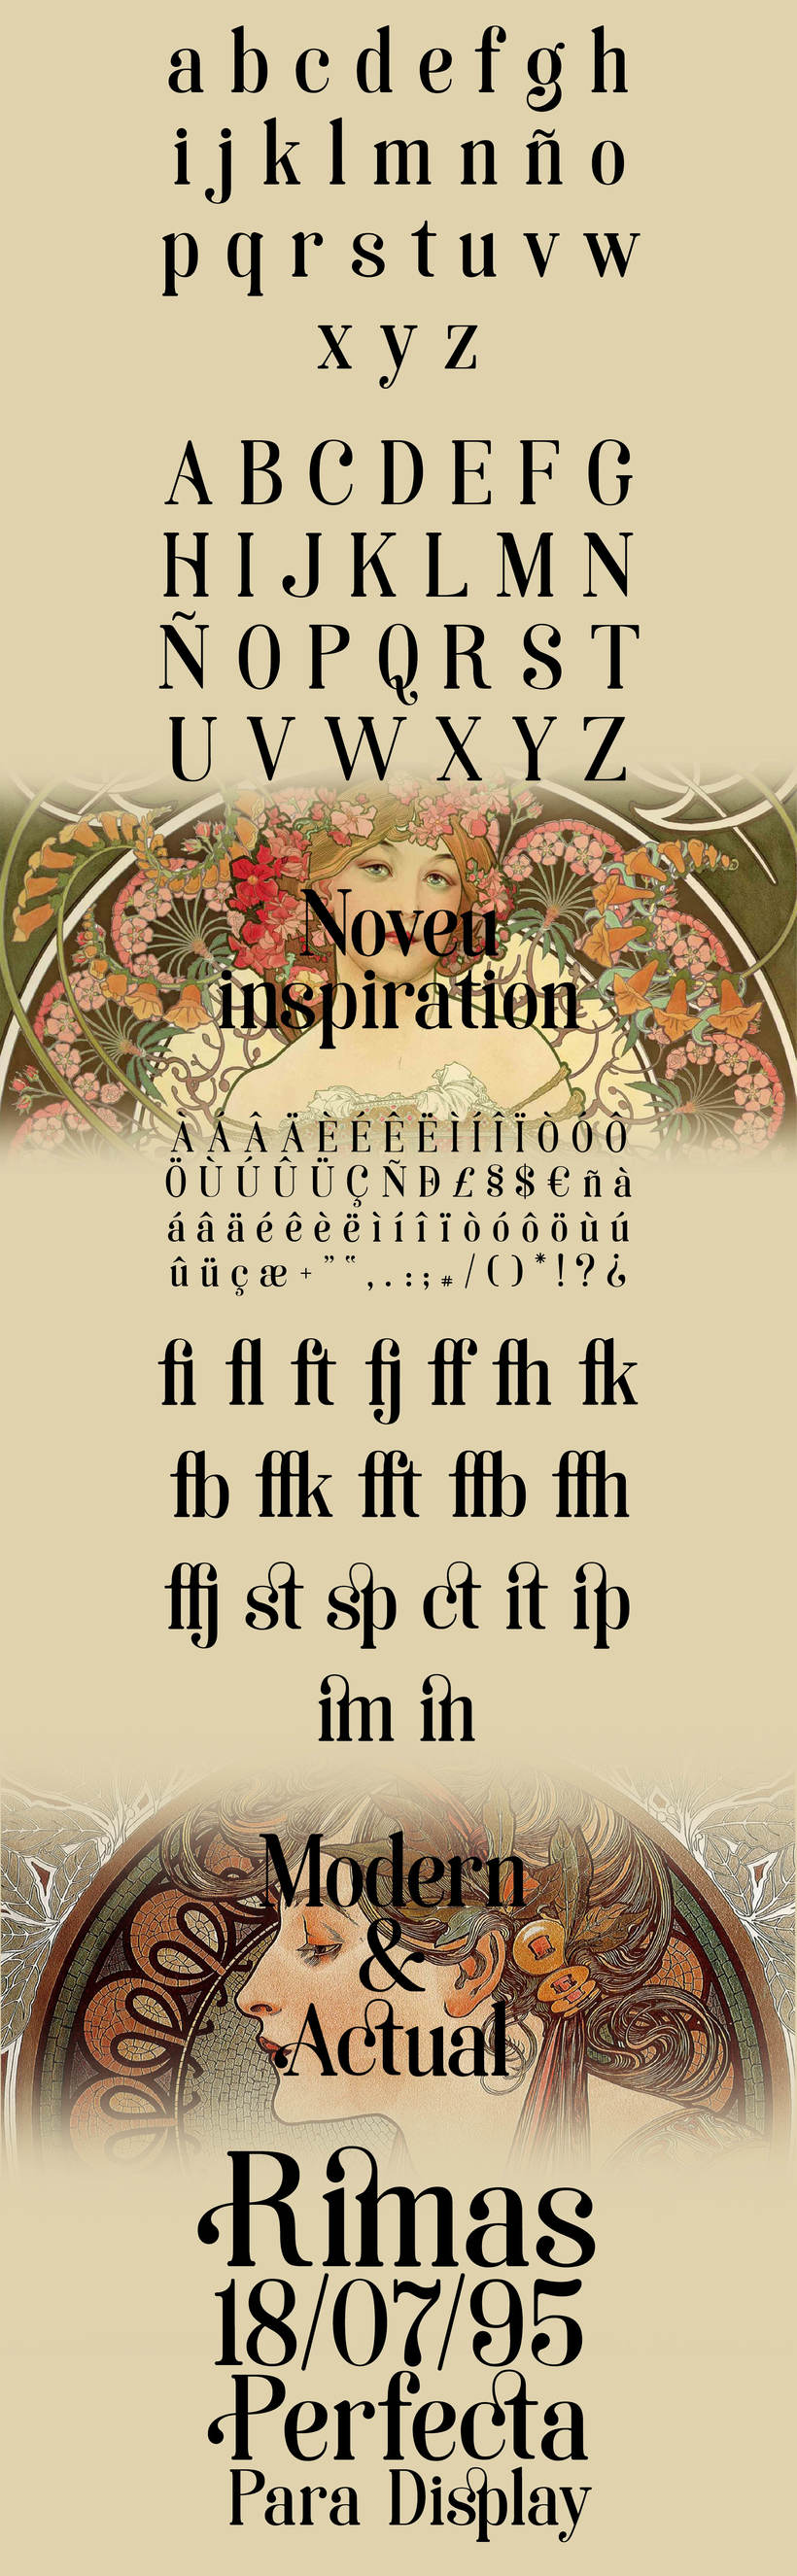 Soria- Free noveau typeface 1